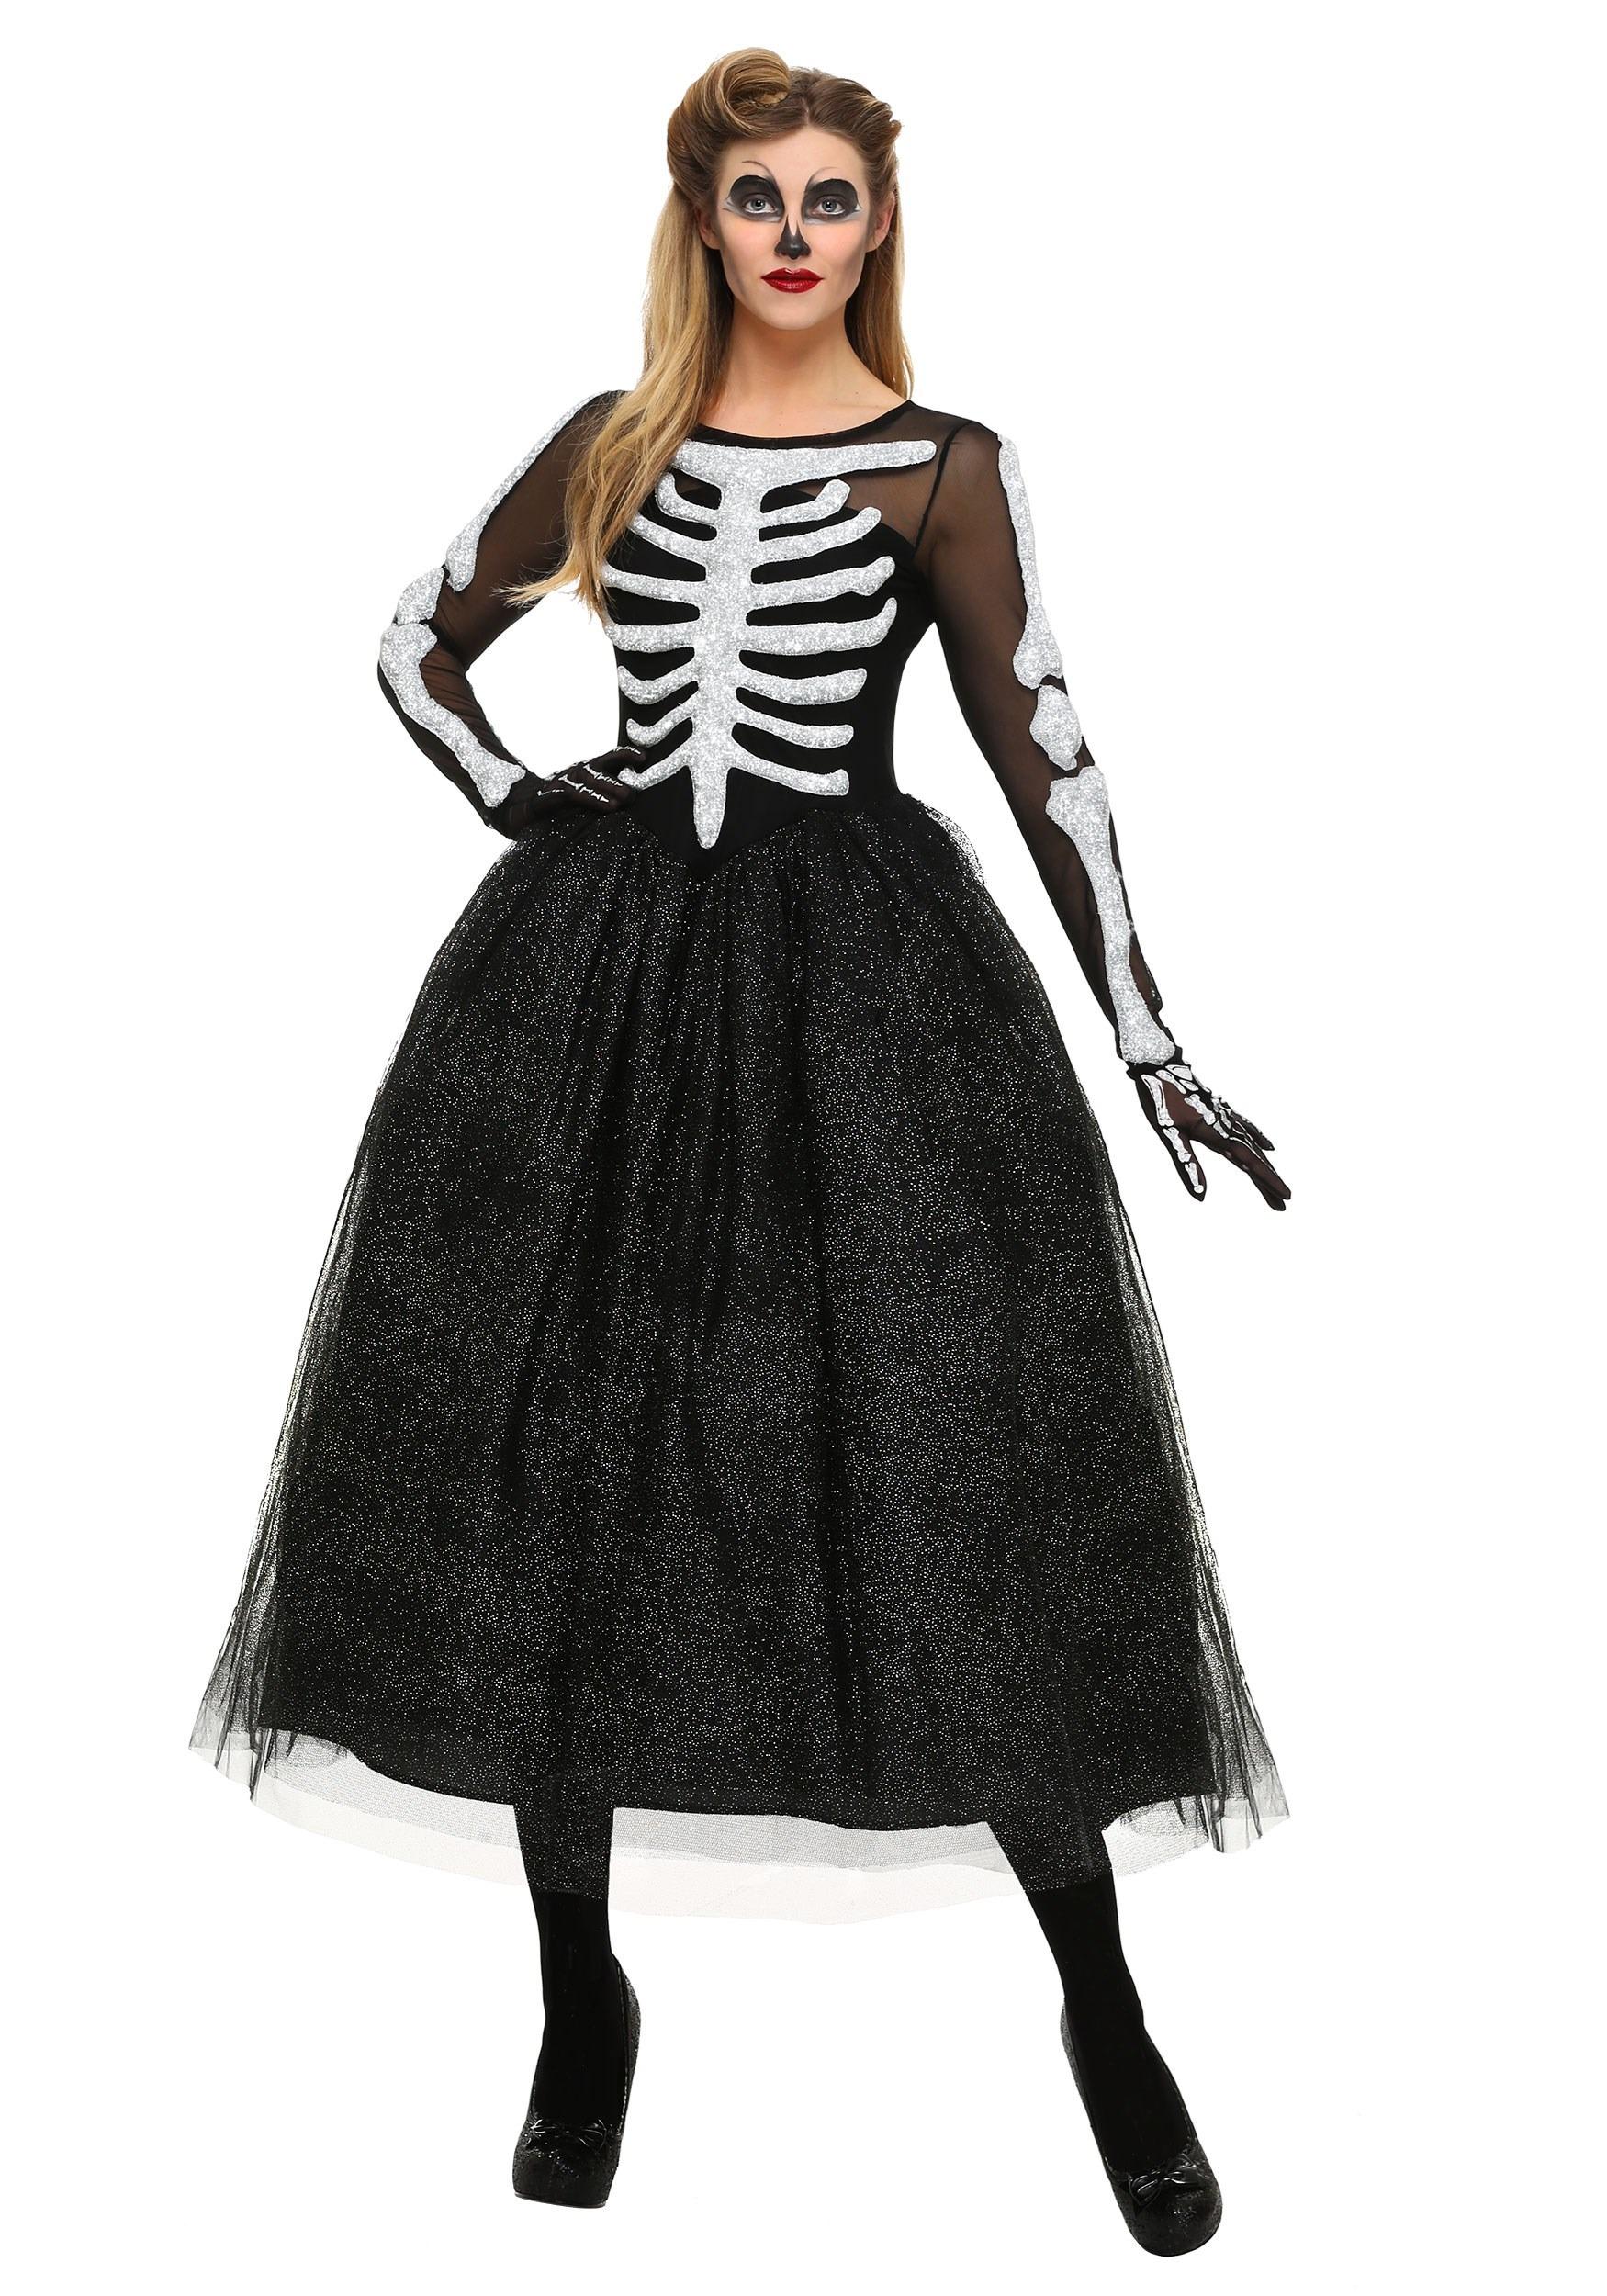 Skeleton_Beauty_Plus_Size_Costume_for_Women